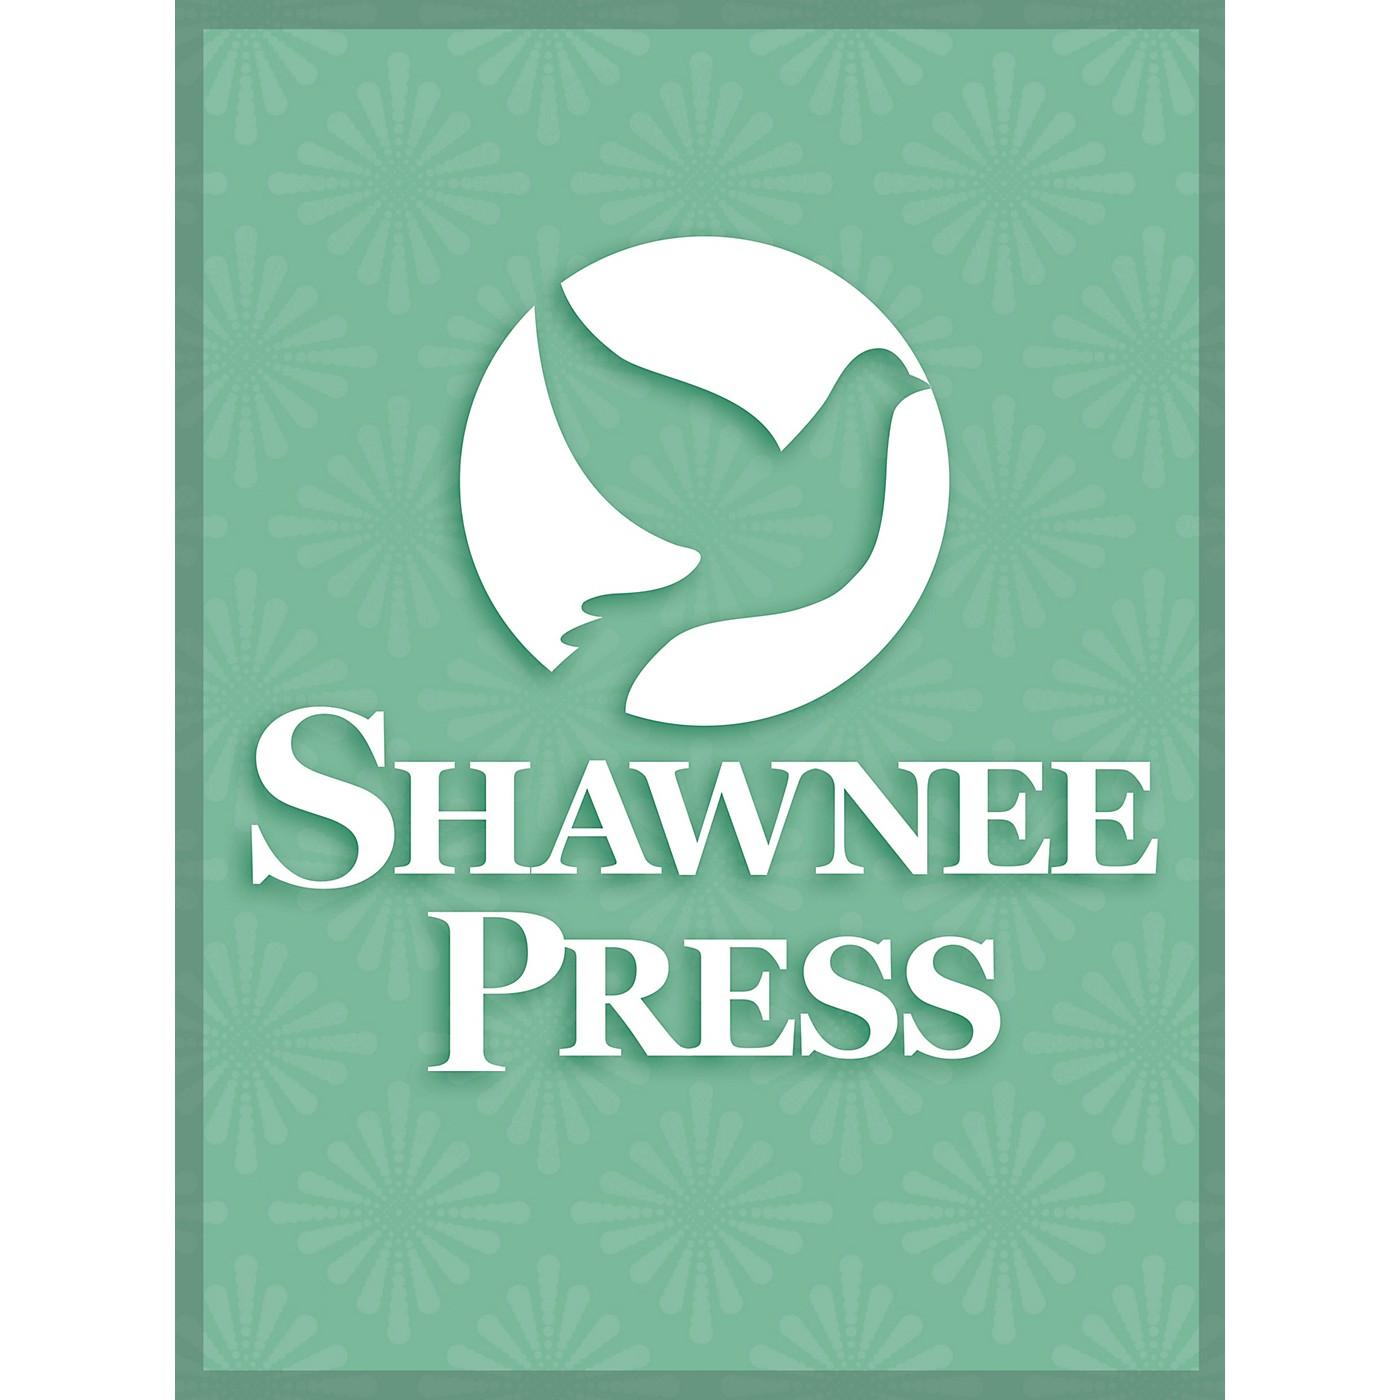 Shawnee Press Gloria in Excelsis (Brass Choir) INSTRUMENTAL ACCOMP PARTS Arranged by Hoggard thumbnail